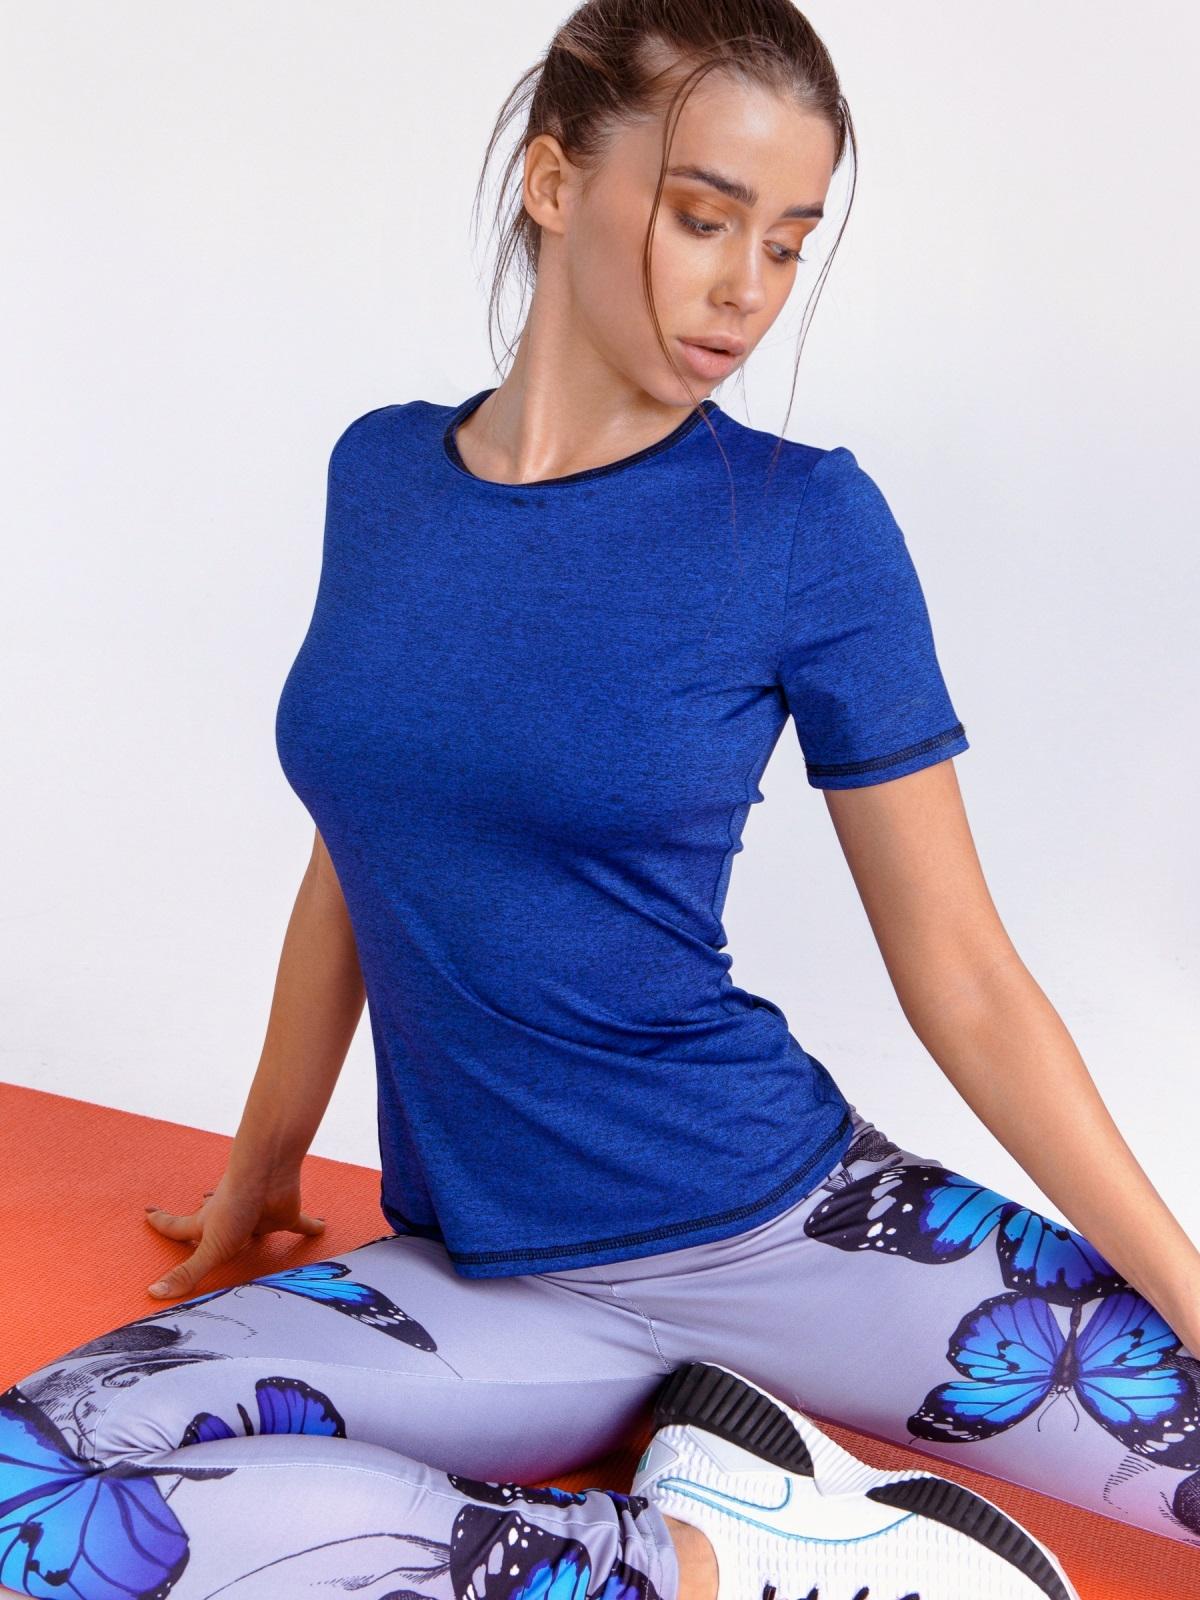 Спортивная футболка из трикотажа синяя - 44650, фото 1 – интернет-магазин Dressa